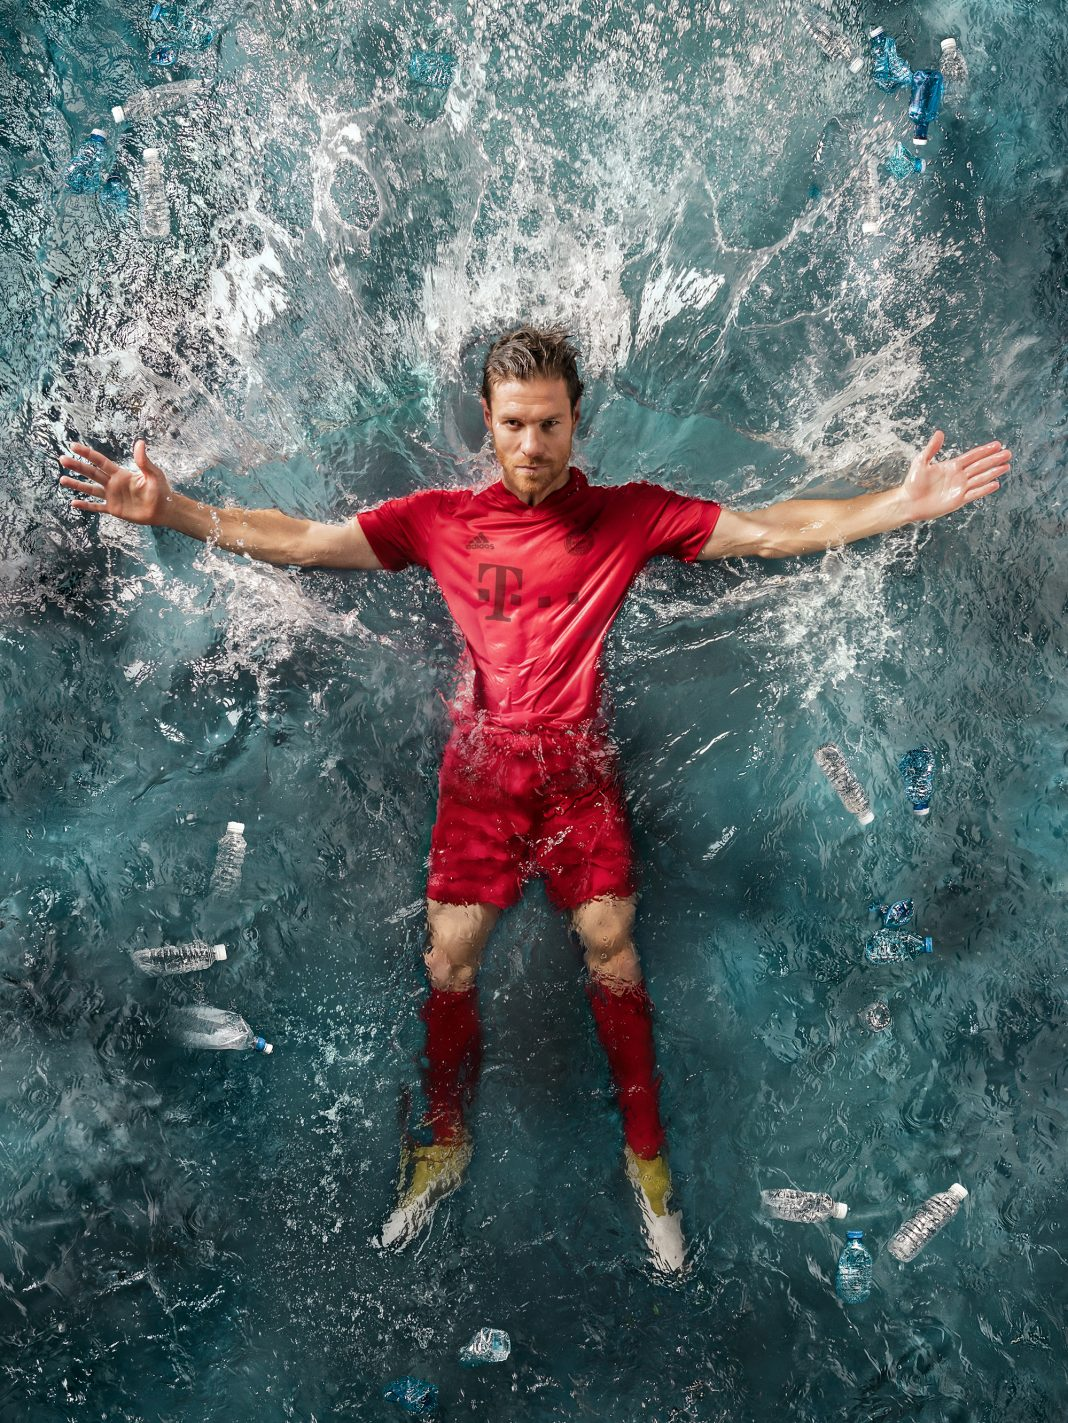 Man wearing soccer uniform falling backward into water (Courtesy of Adidas)